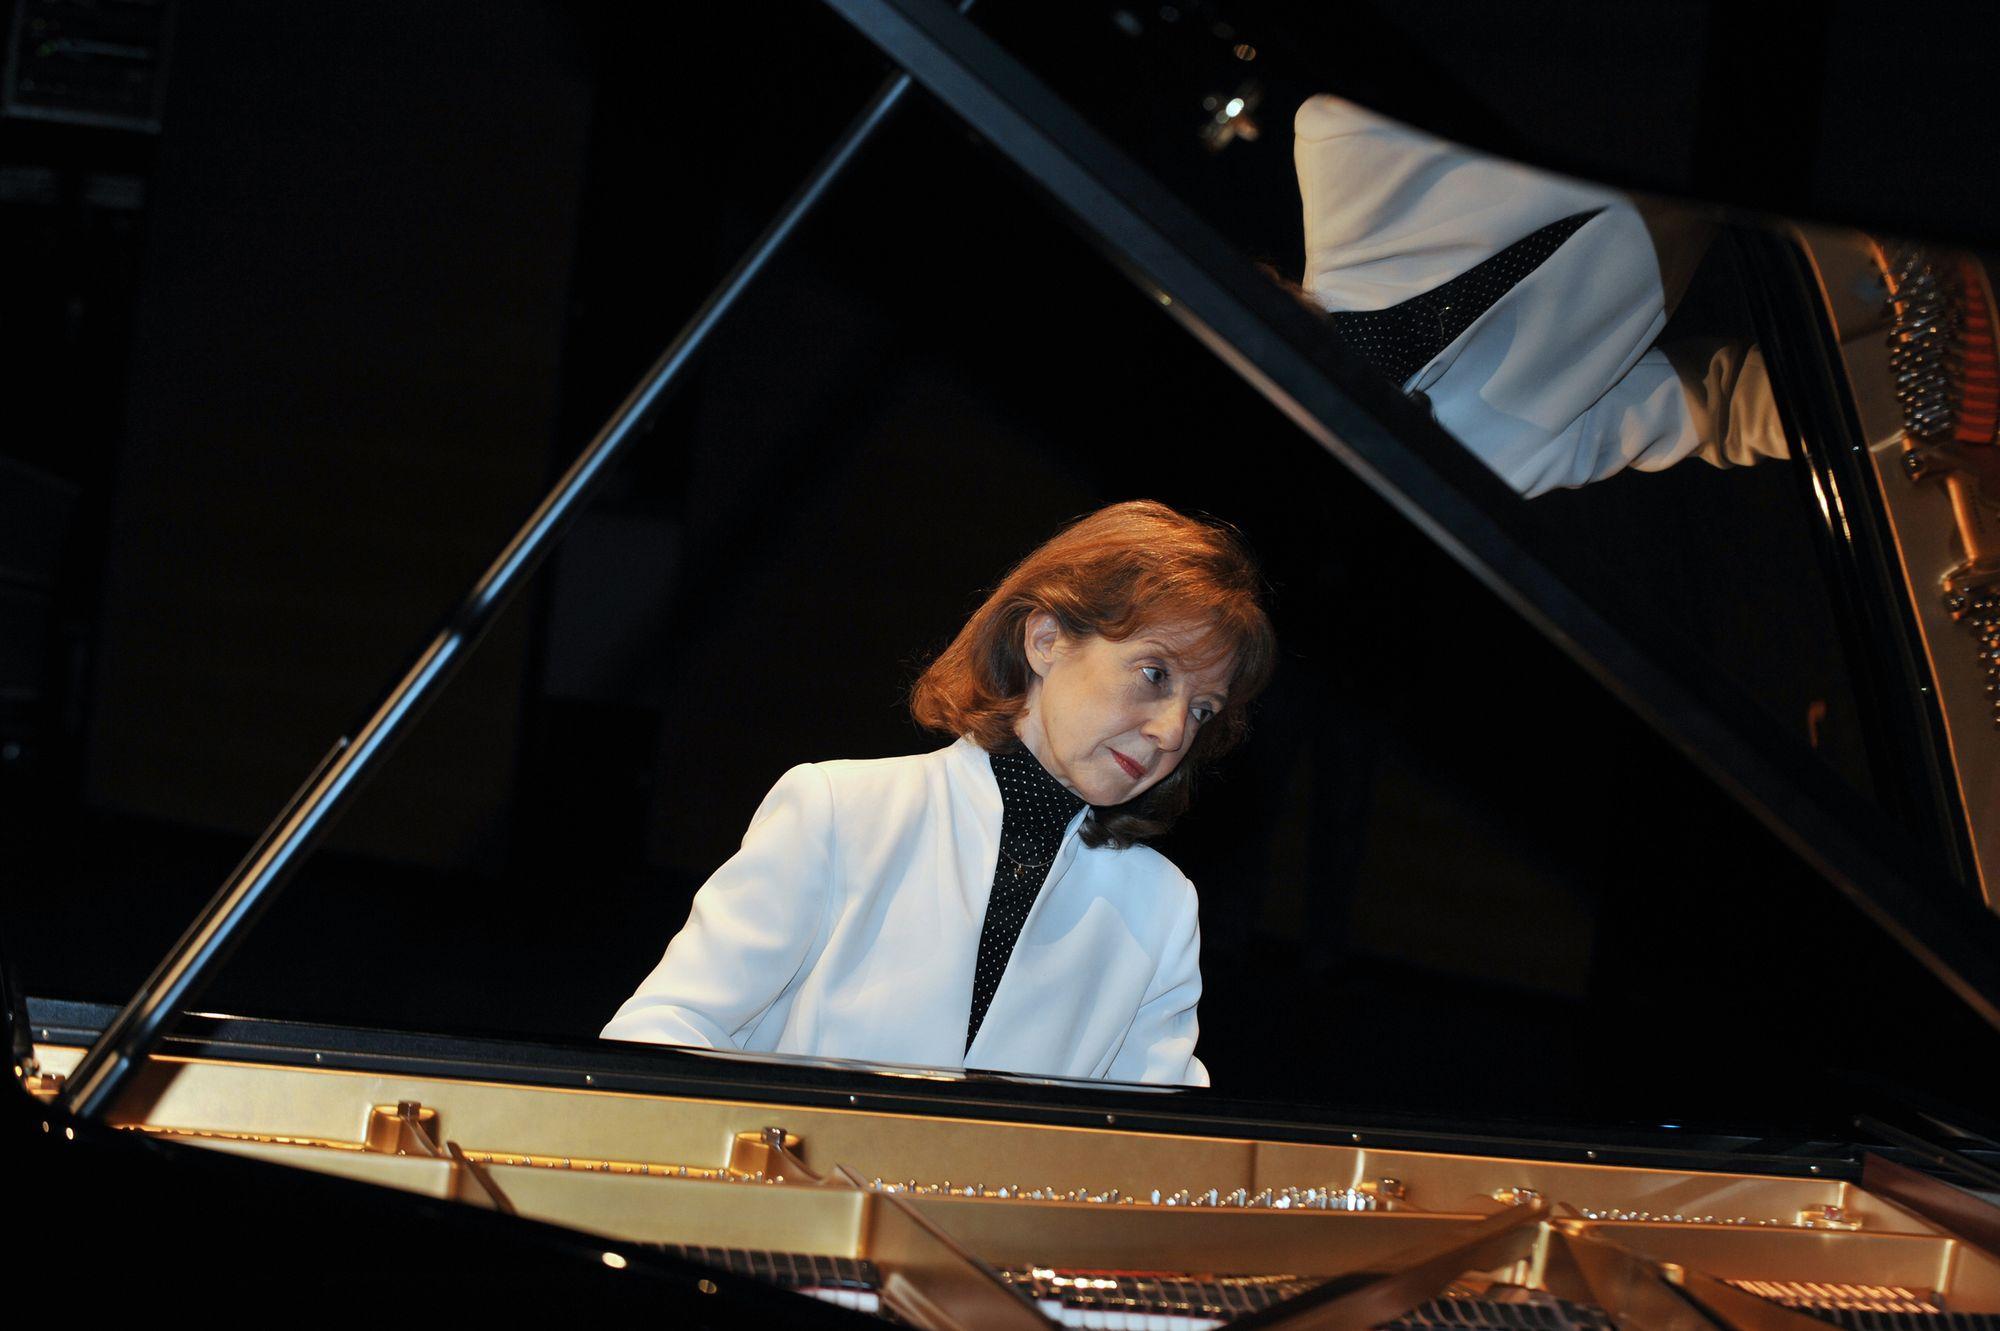 Le concours international de piano clara haskil - Concours international de musique de chambre de lyon ...